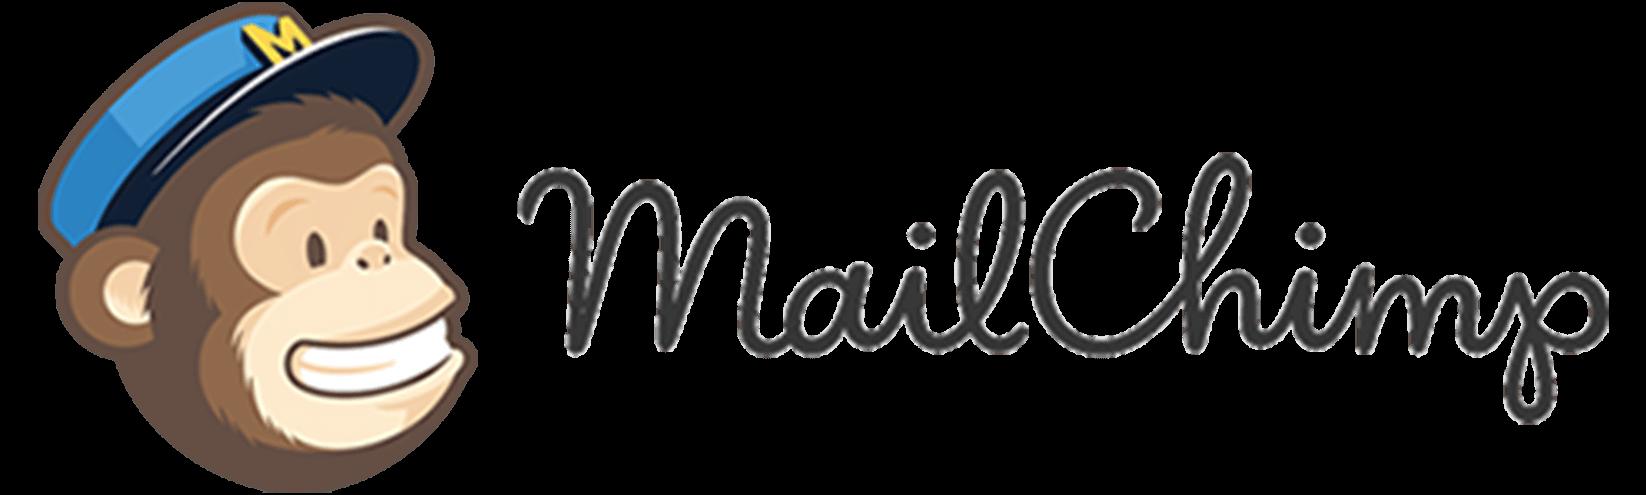 MailChimp1